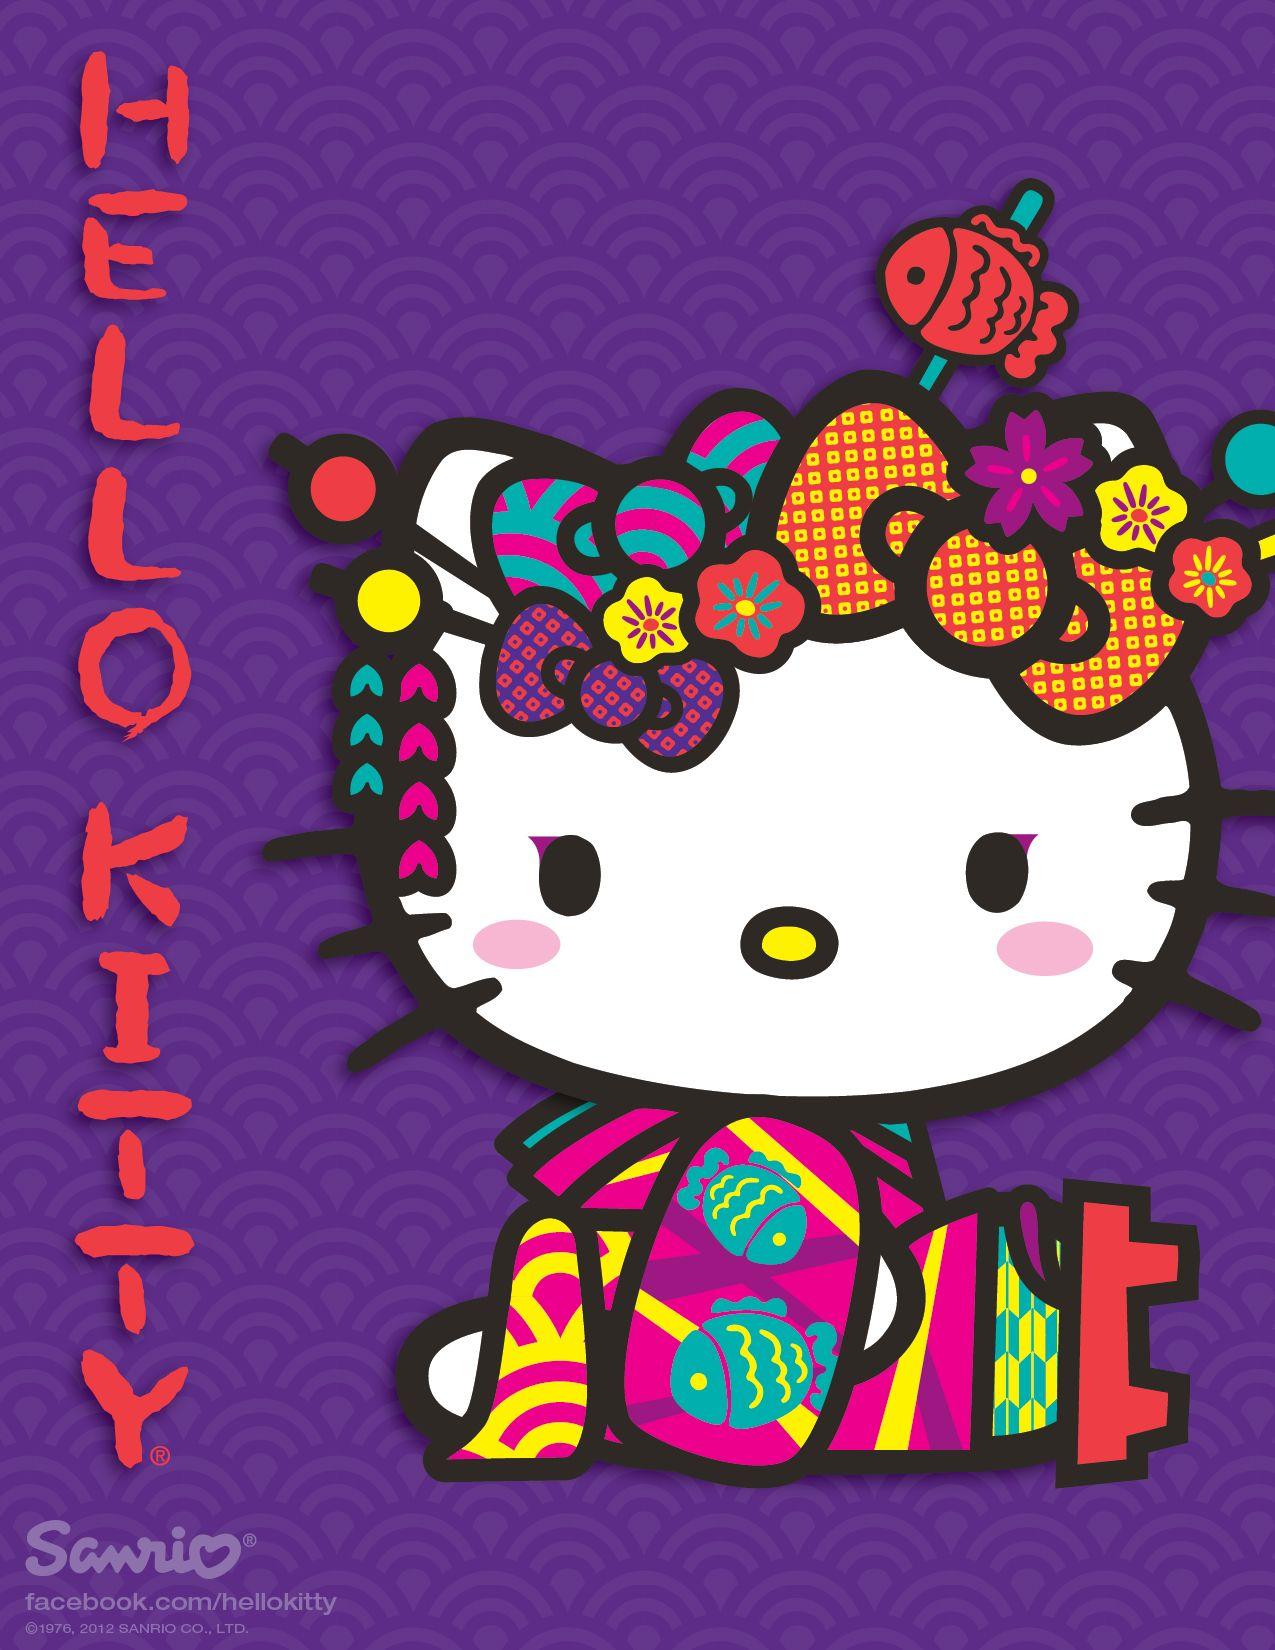 Top Wallpaper Hello Kitty Facebook - 4920fec666ae0ee65cfb89148ed7150d  Pic_37869.jpg